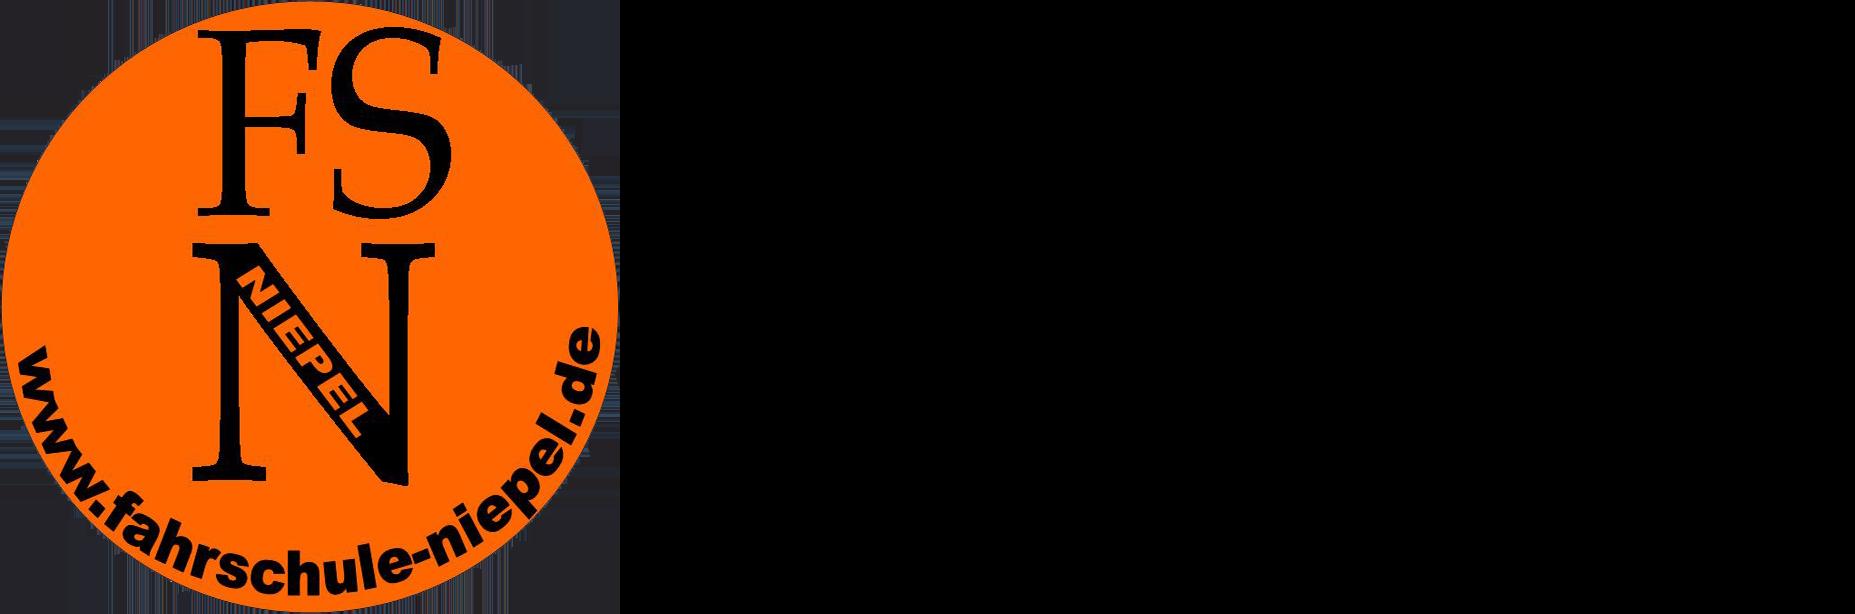 Fahrschule Niepel Logo